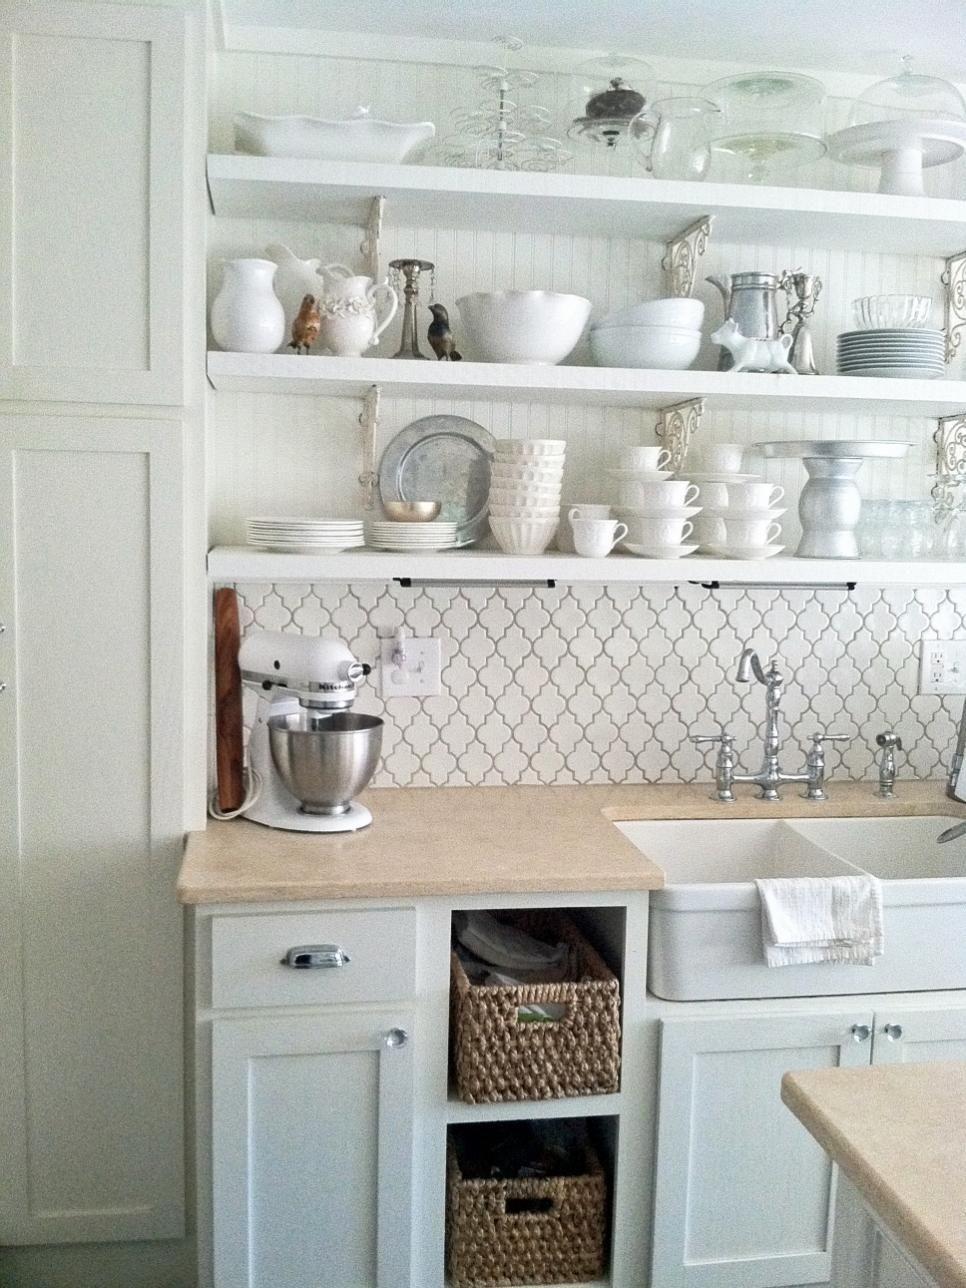 Pictures Of Kitchen Backsplash Ideas From Hgtv Cottage Style Kitchen Home Kitchens Farmhouse Kitchen Backsplash Cottage kitchen backsplash ideas